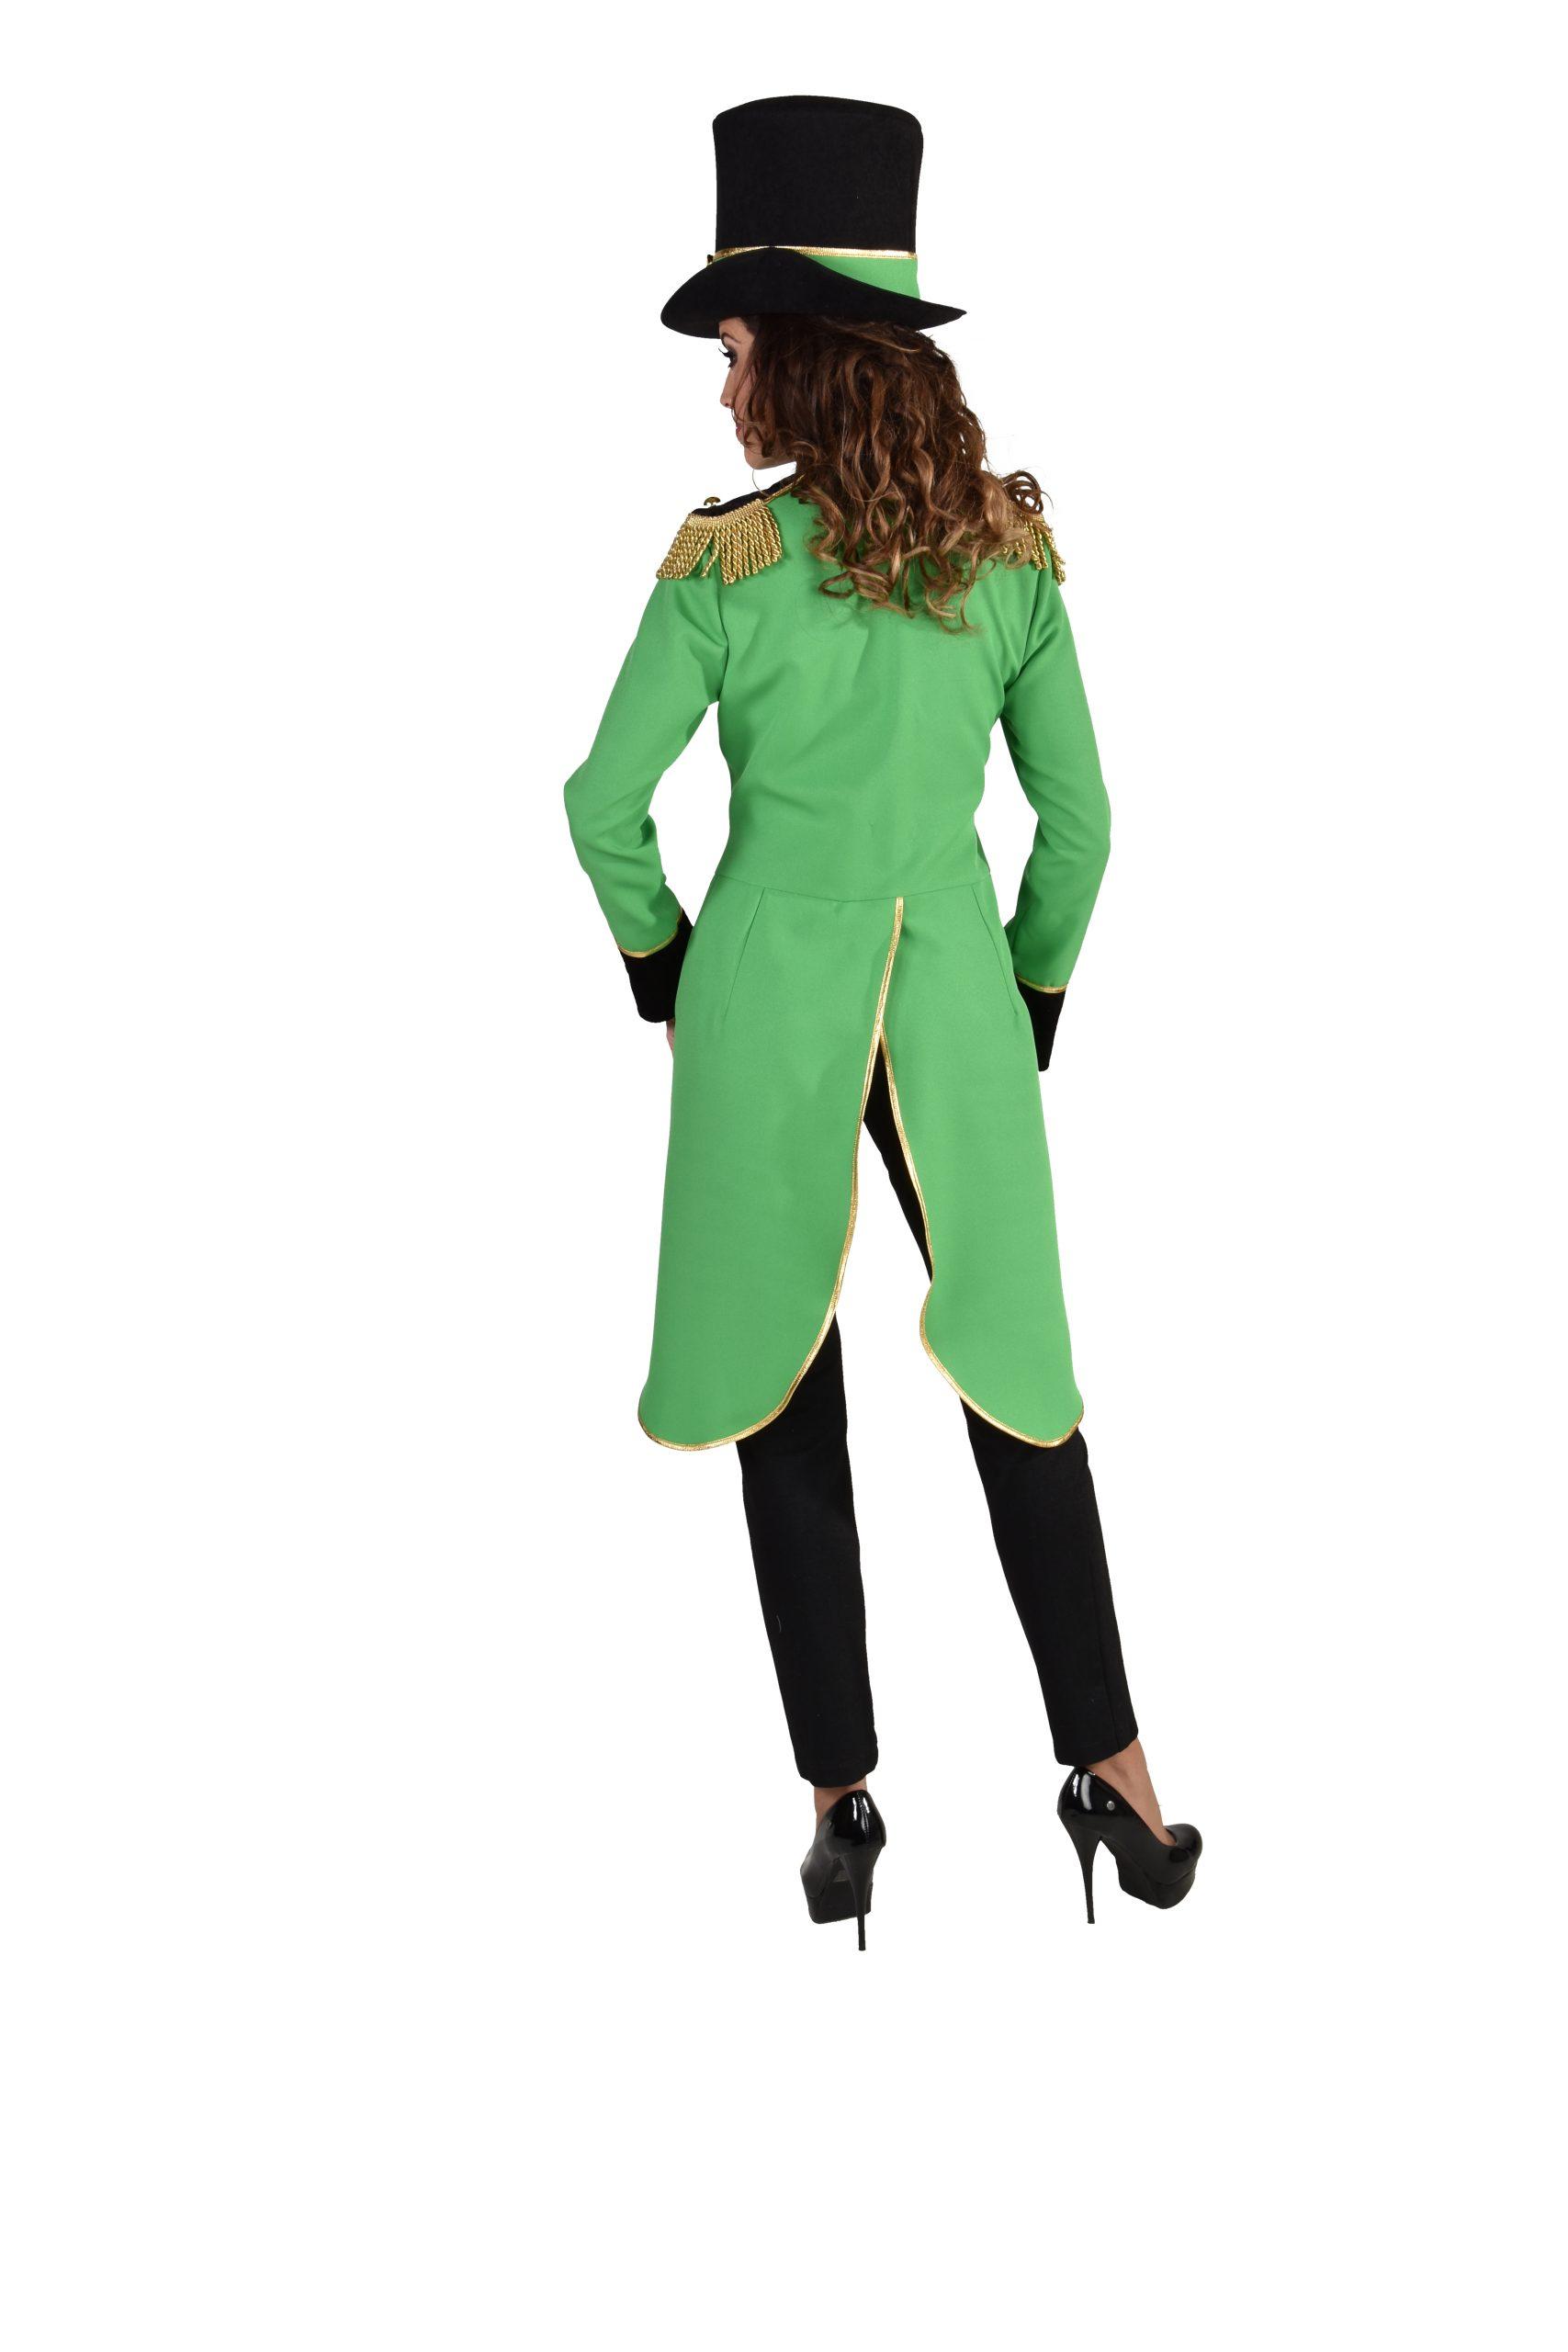 Slipjas St.Patrick's Day Groen Dames